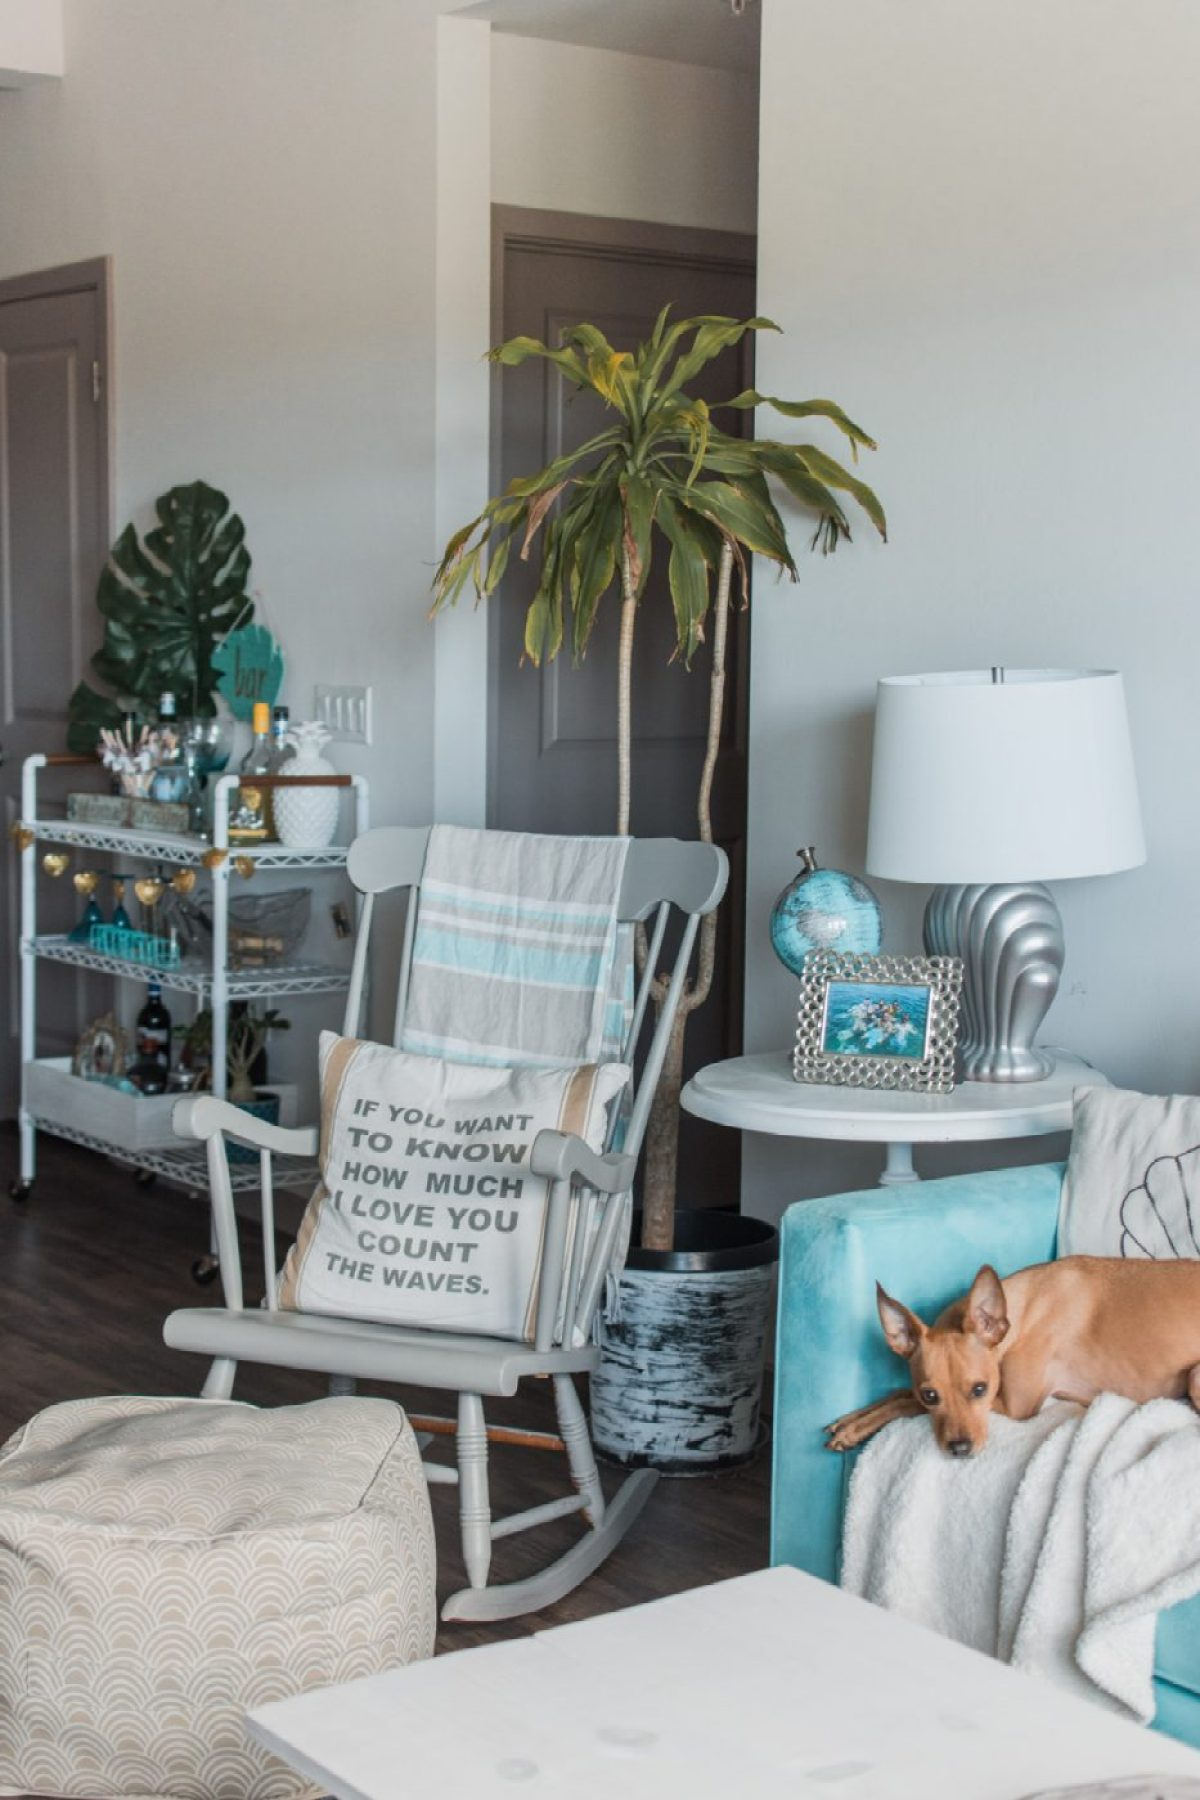 Boho Tropical Living Room with DIY Bar Cart - Sweet Teal